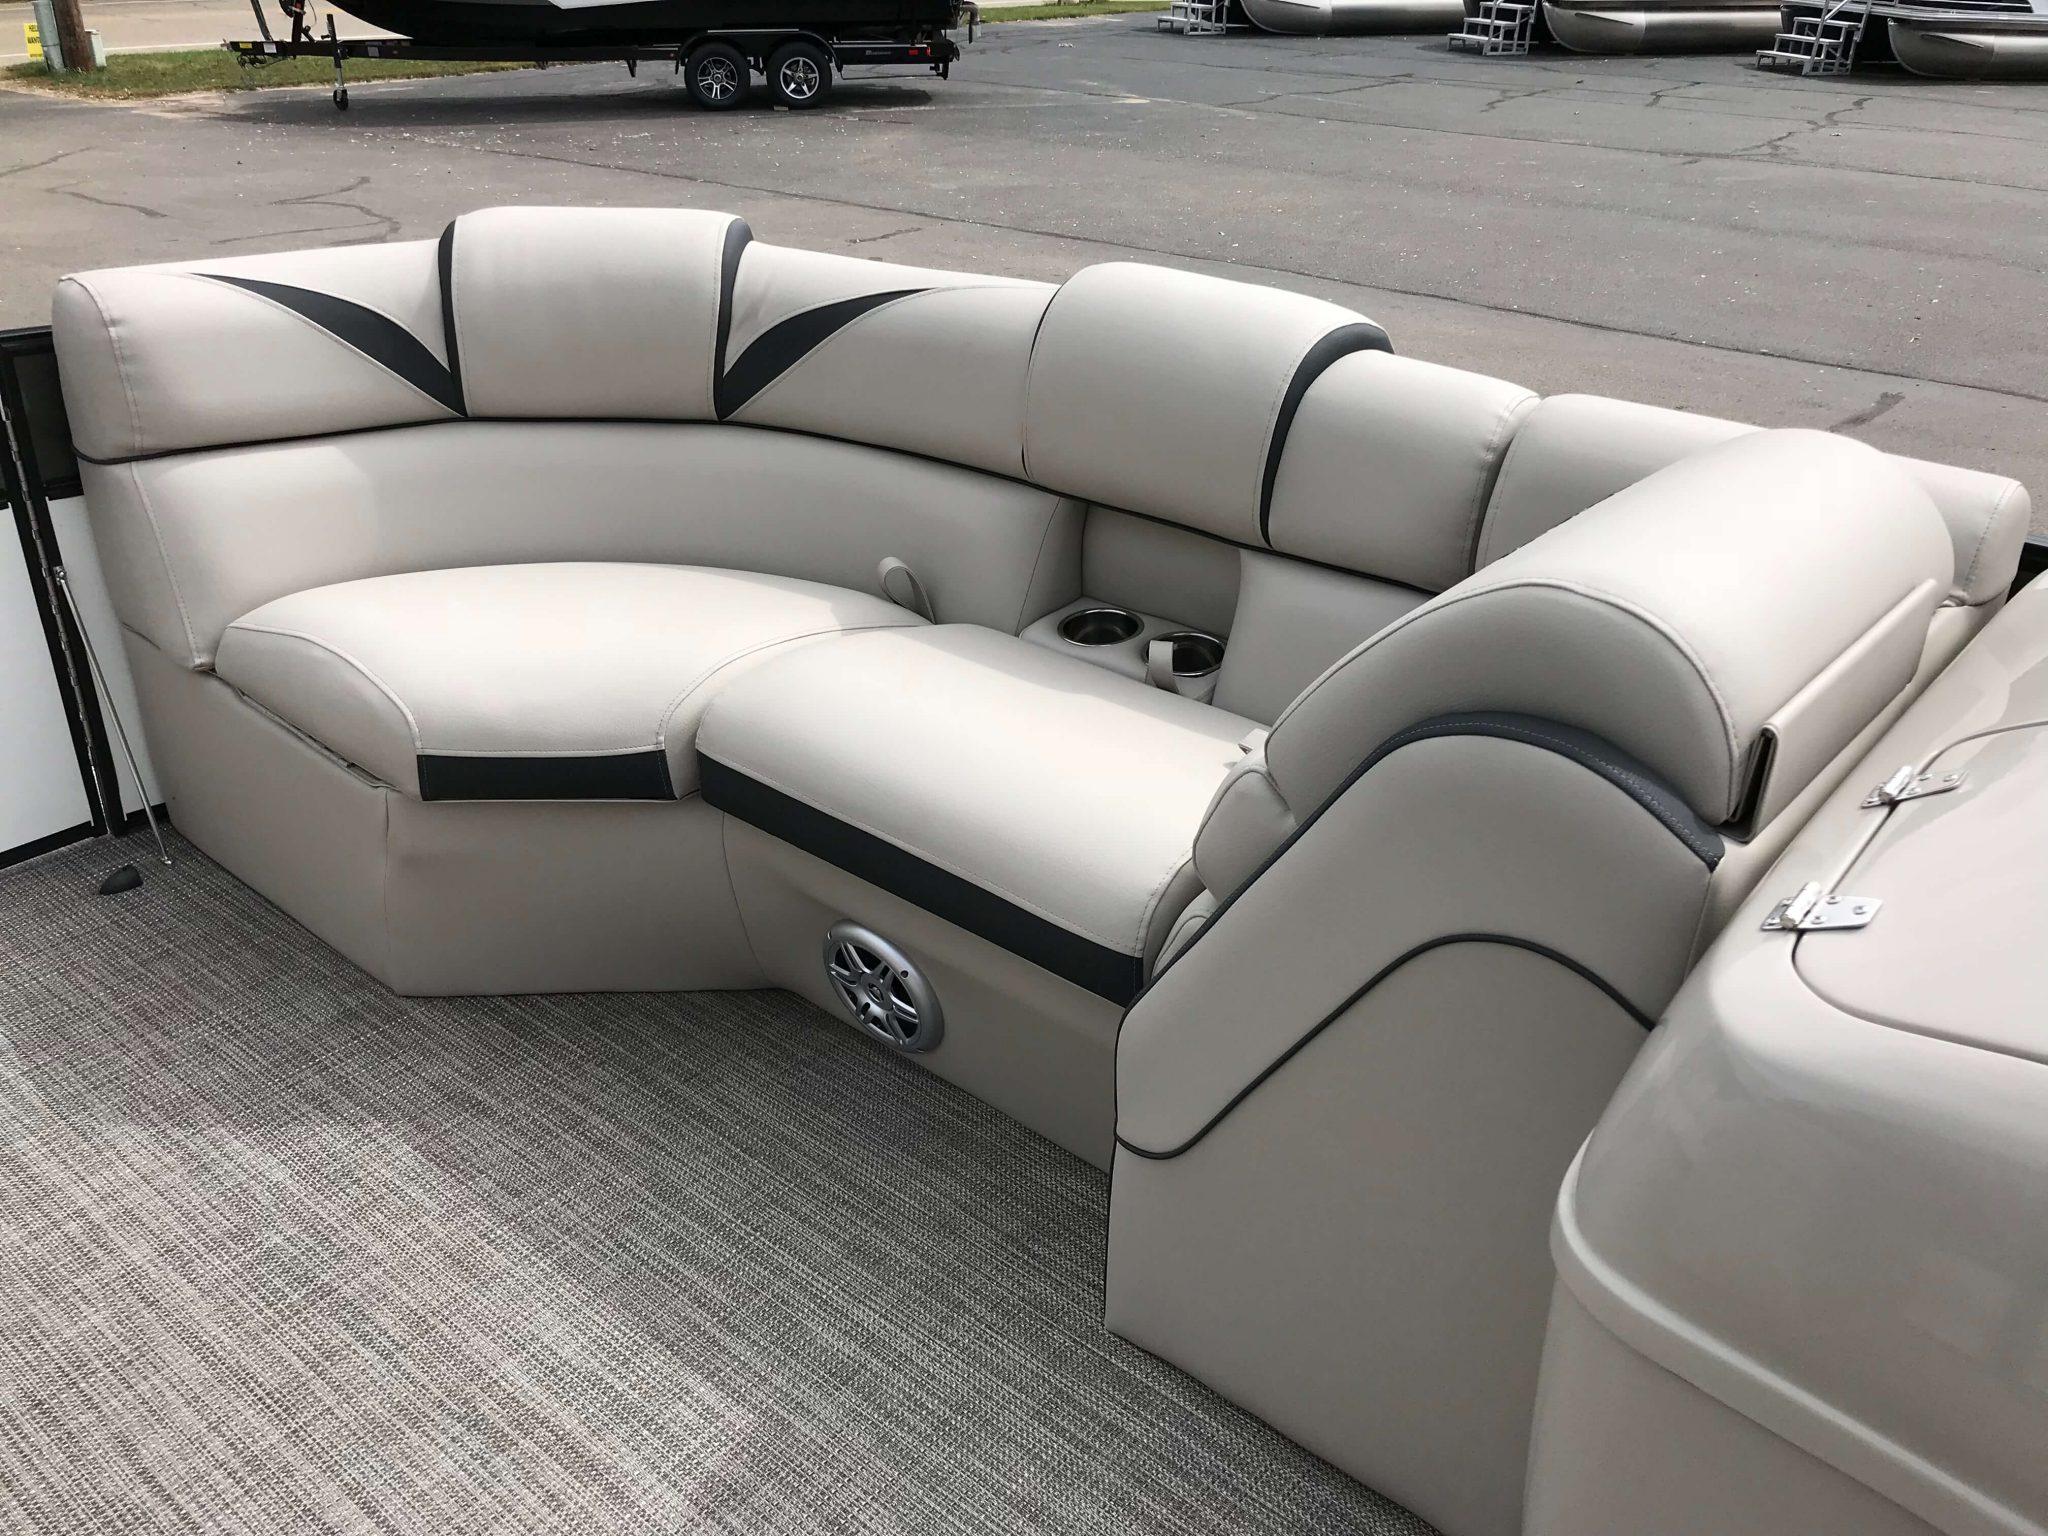 2019 Berkshire 23 SB2 STS Tritoon Interior Bow Seating 3